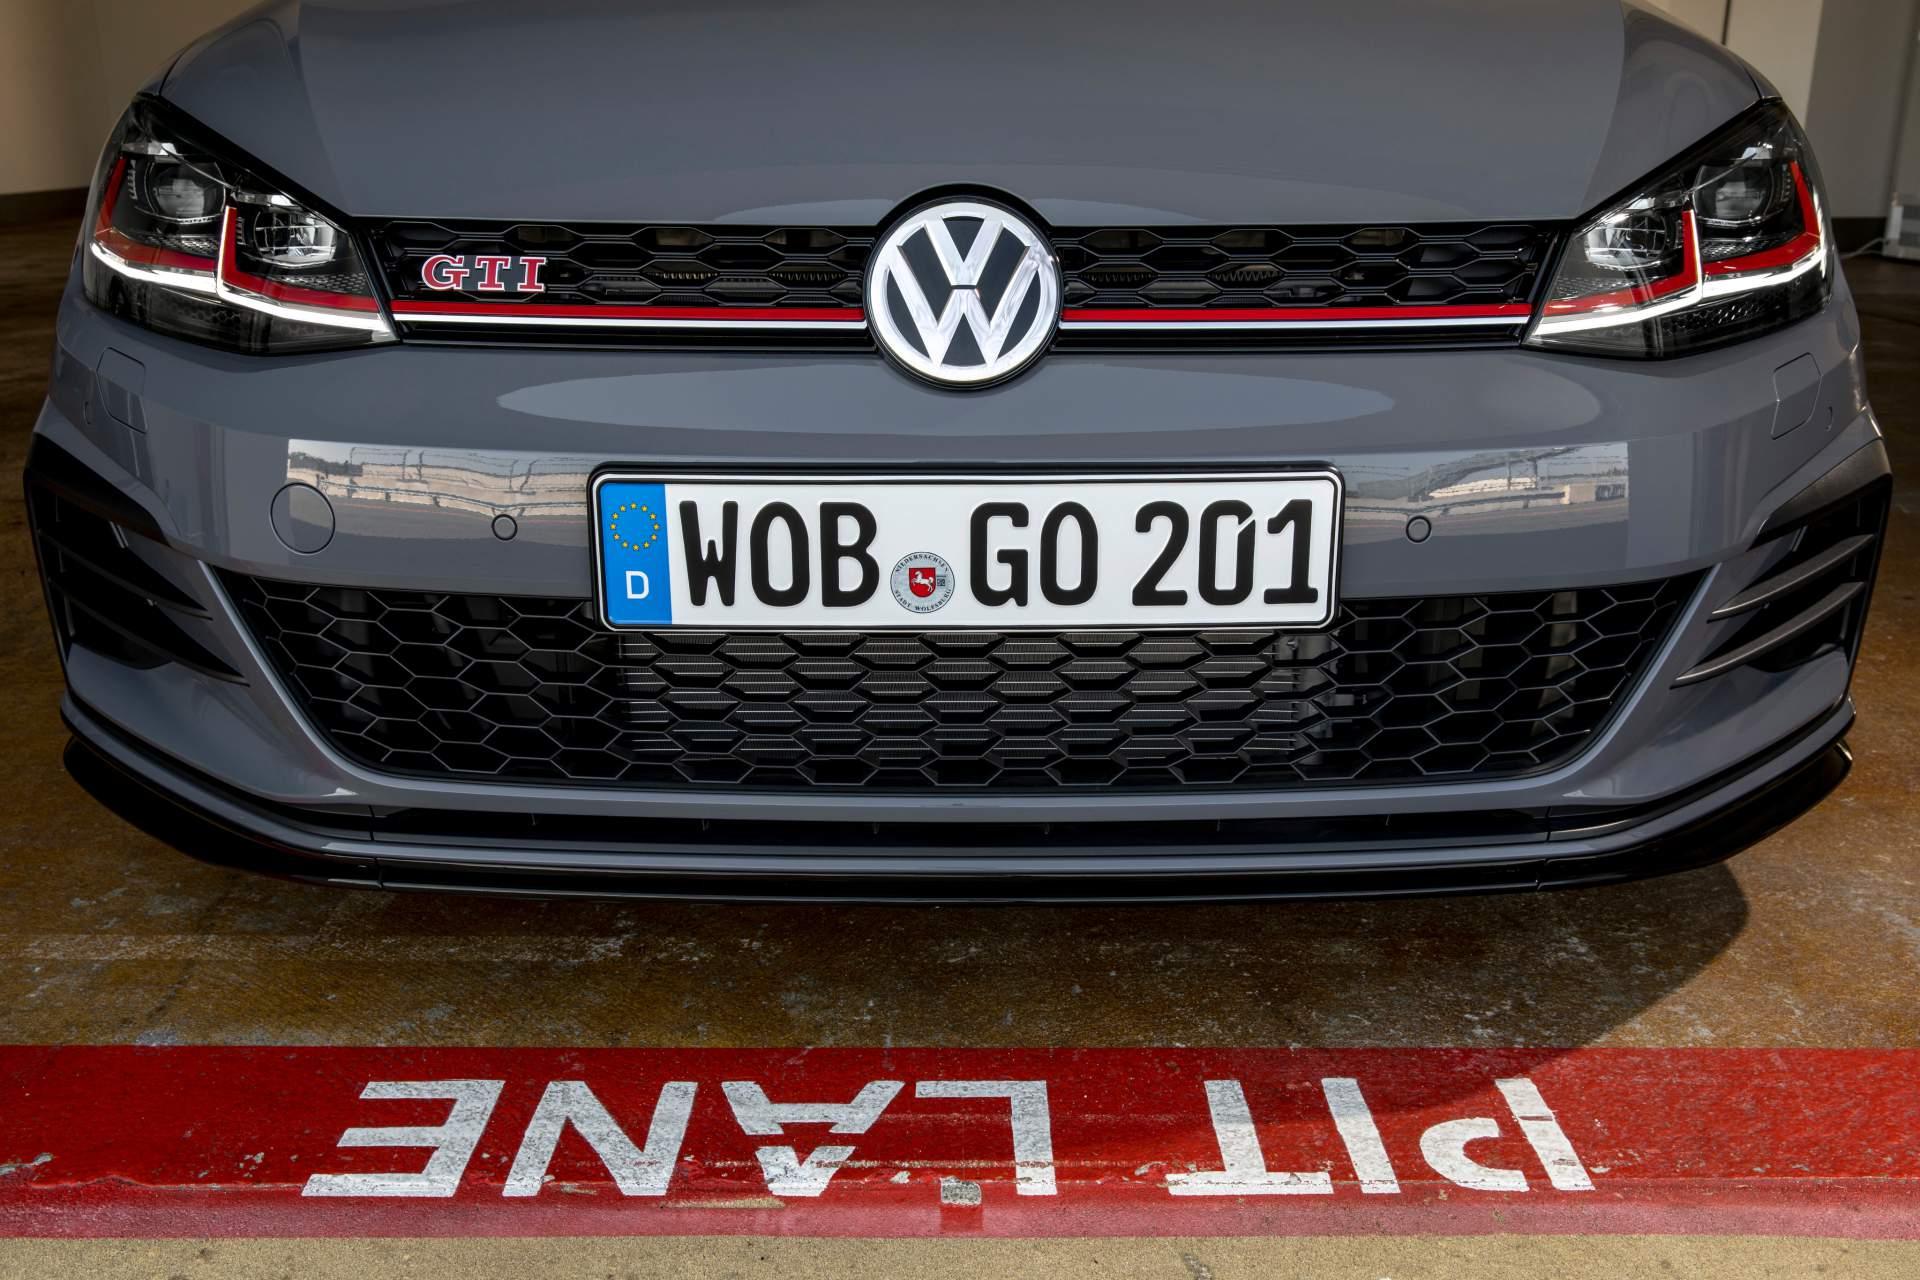 VW Golf GTI TCR